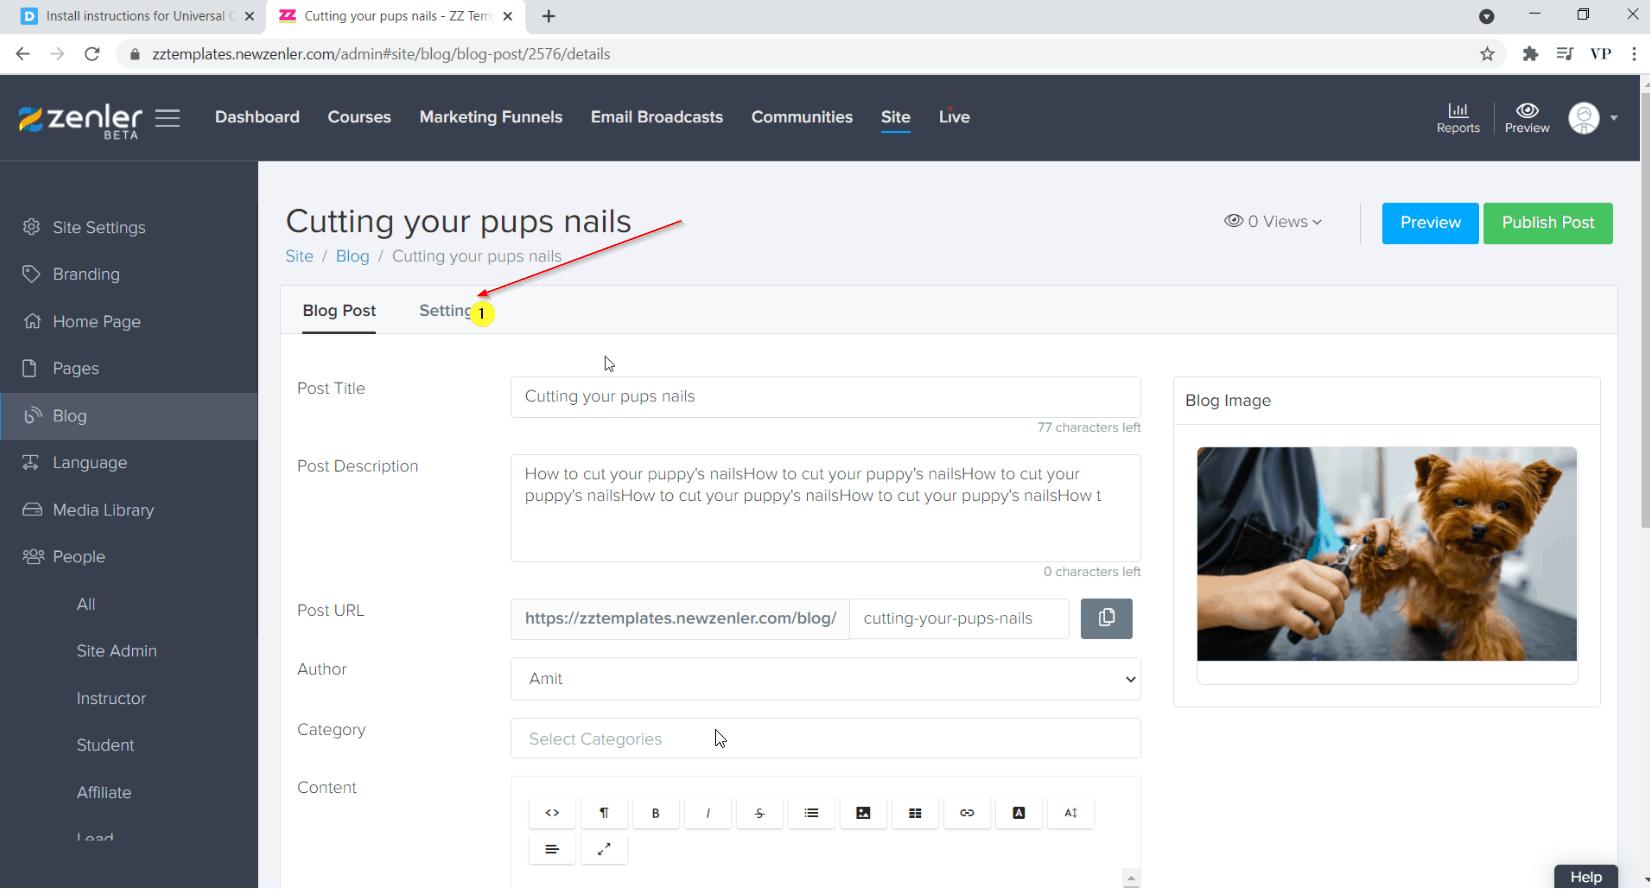 go to blog post settings